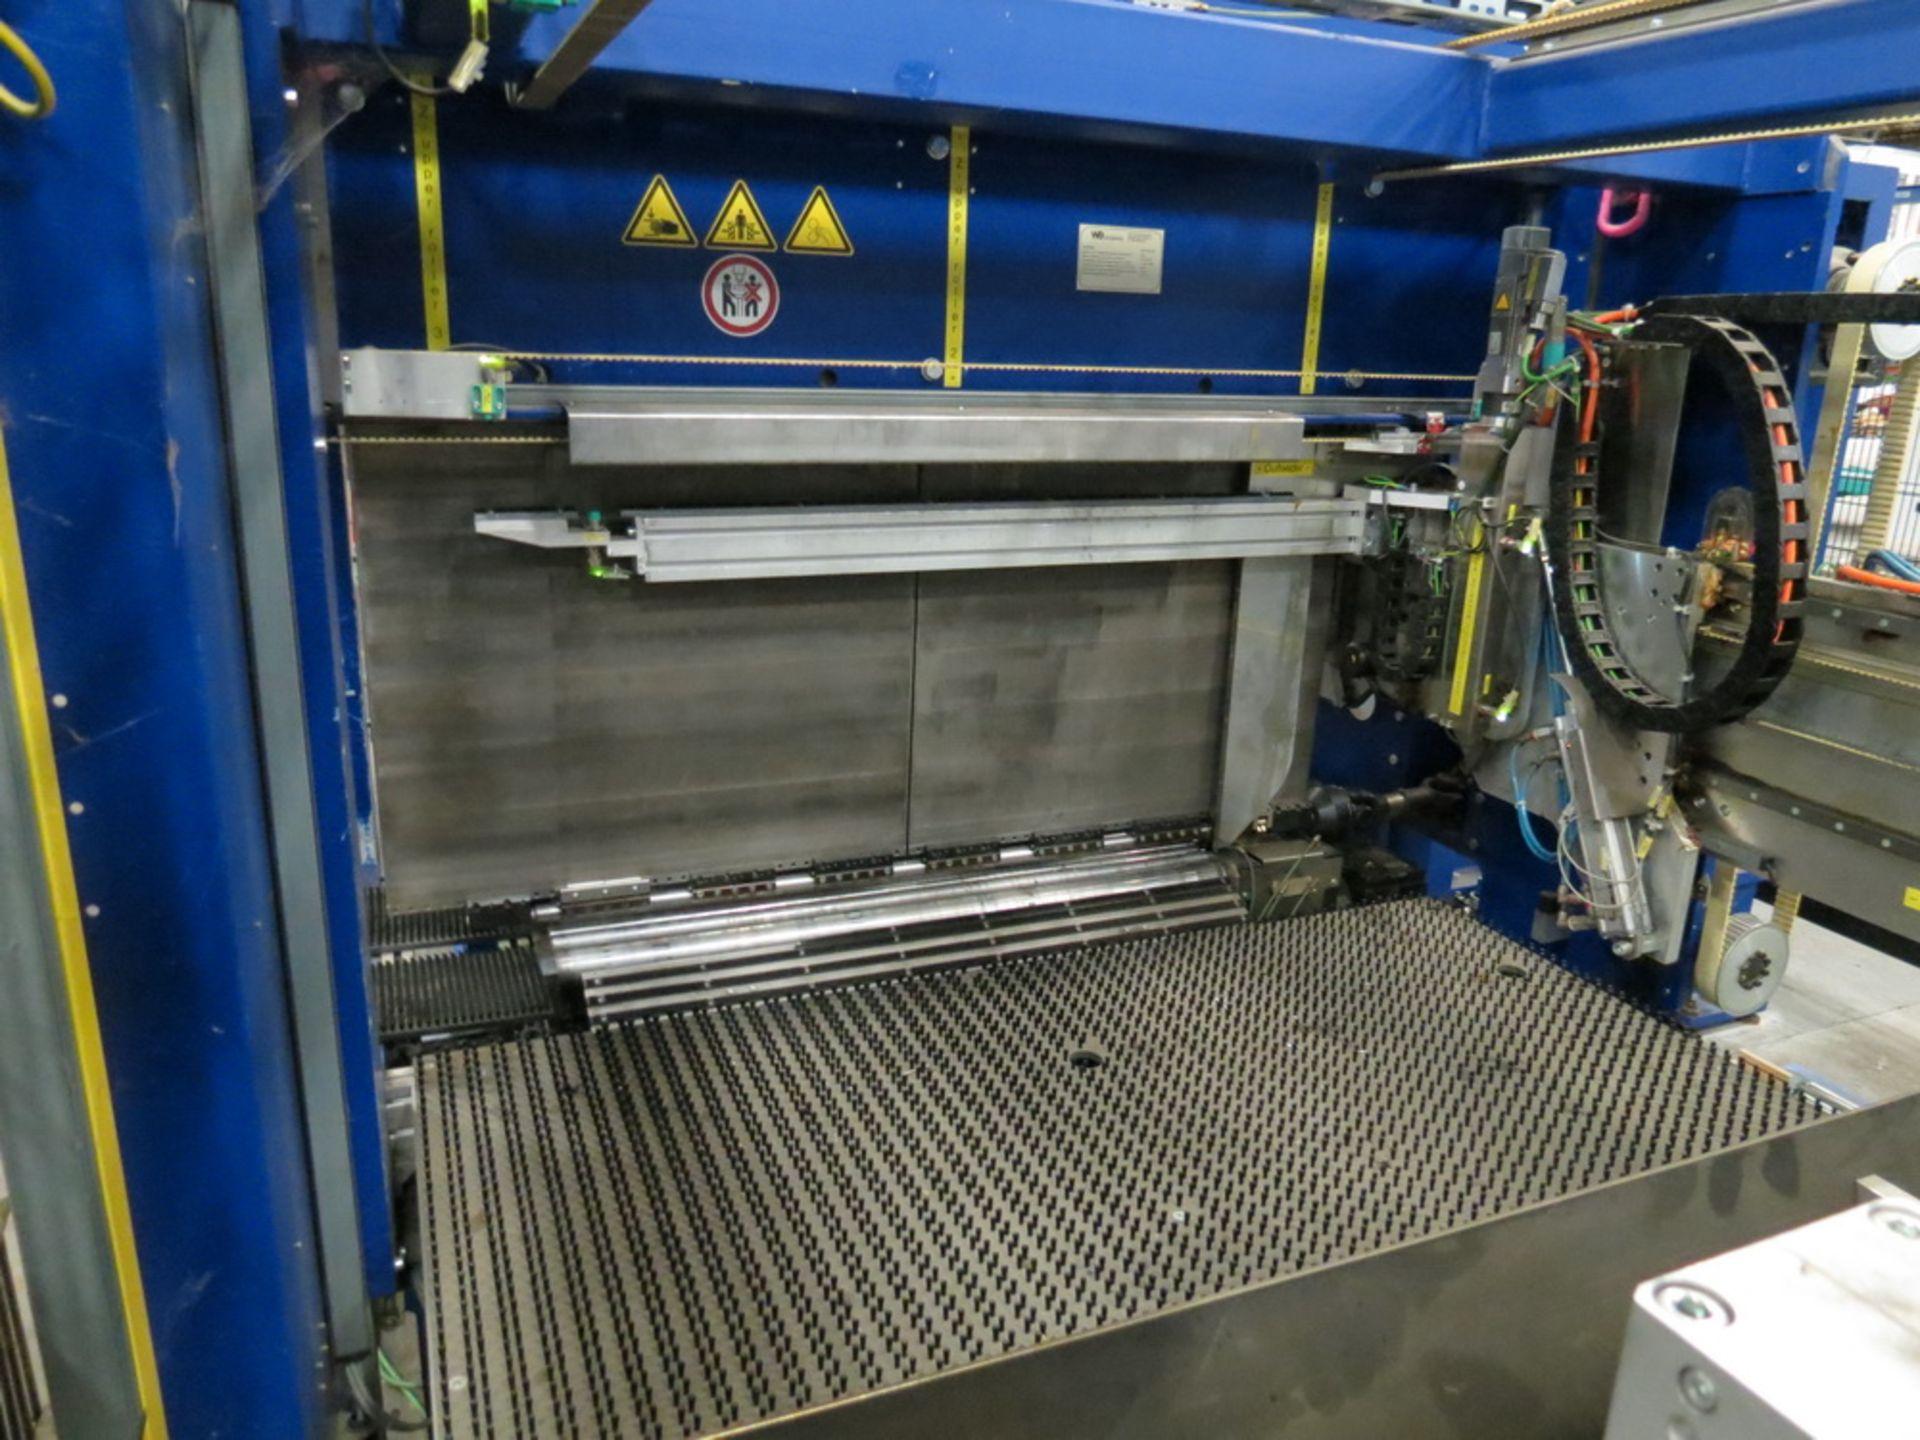 Lot 49 - 2014 Weil Technology NC Multi-roller 600/1250C Bending Machine